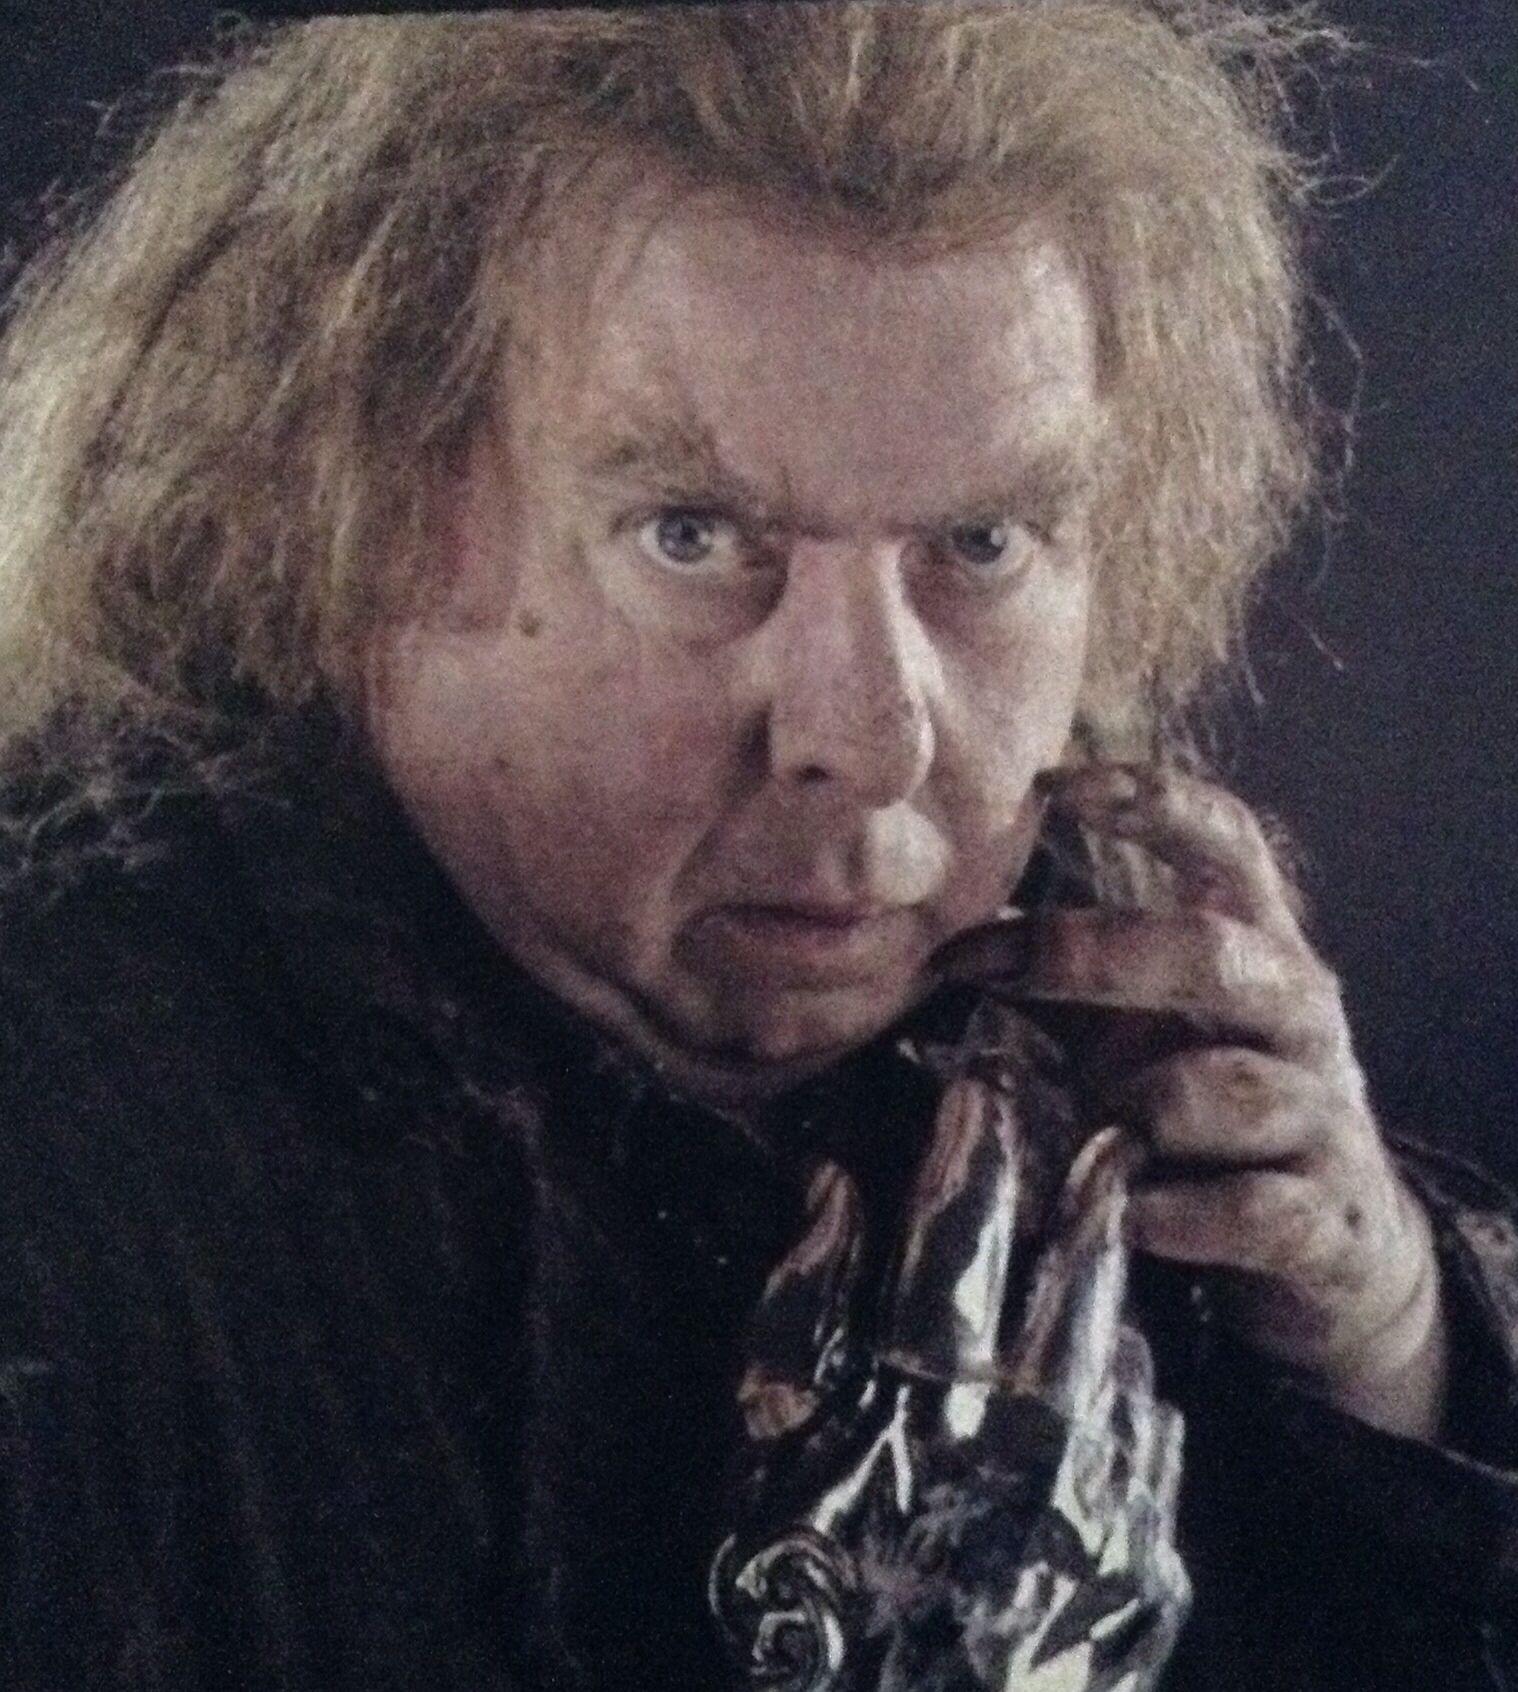 Harry Potter Star Timothy Spall Zauberer Wurmschwanz Hat Sich Halbiert Leute Bild De